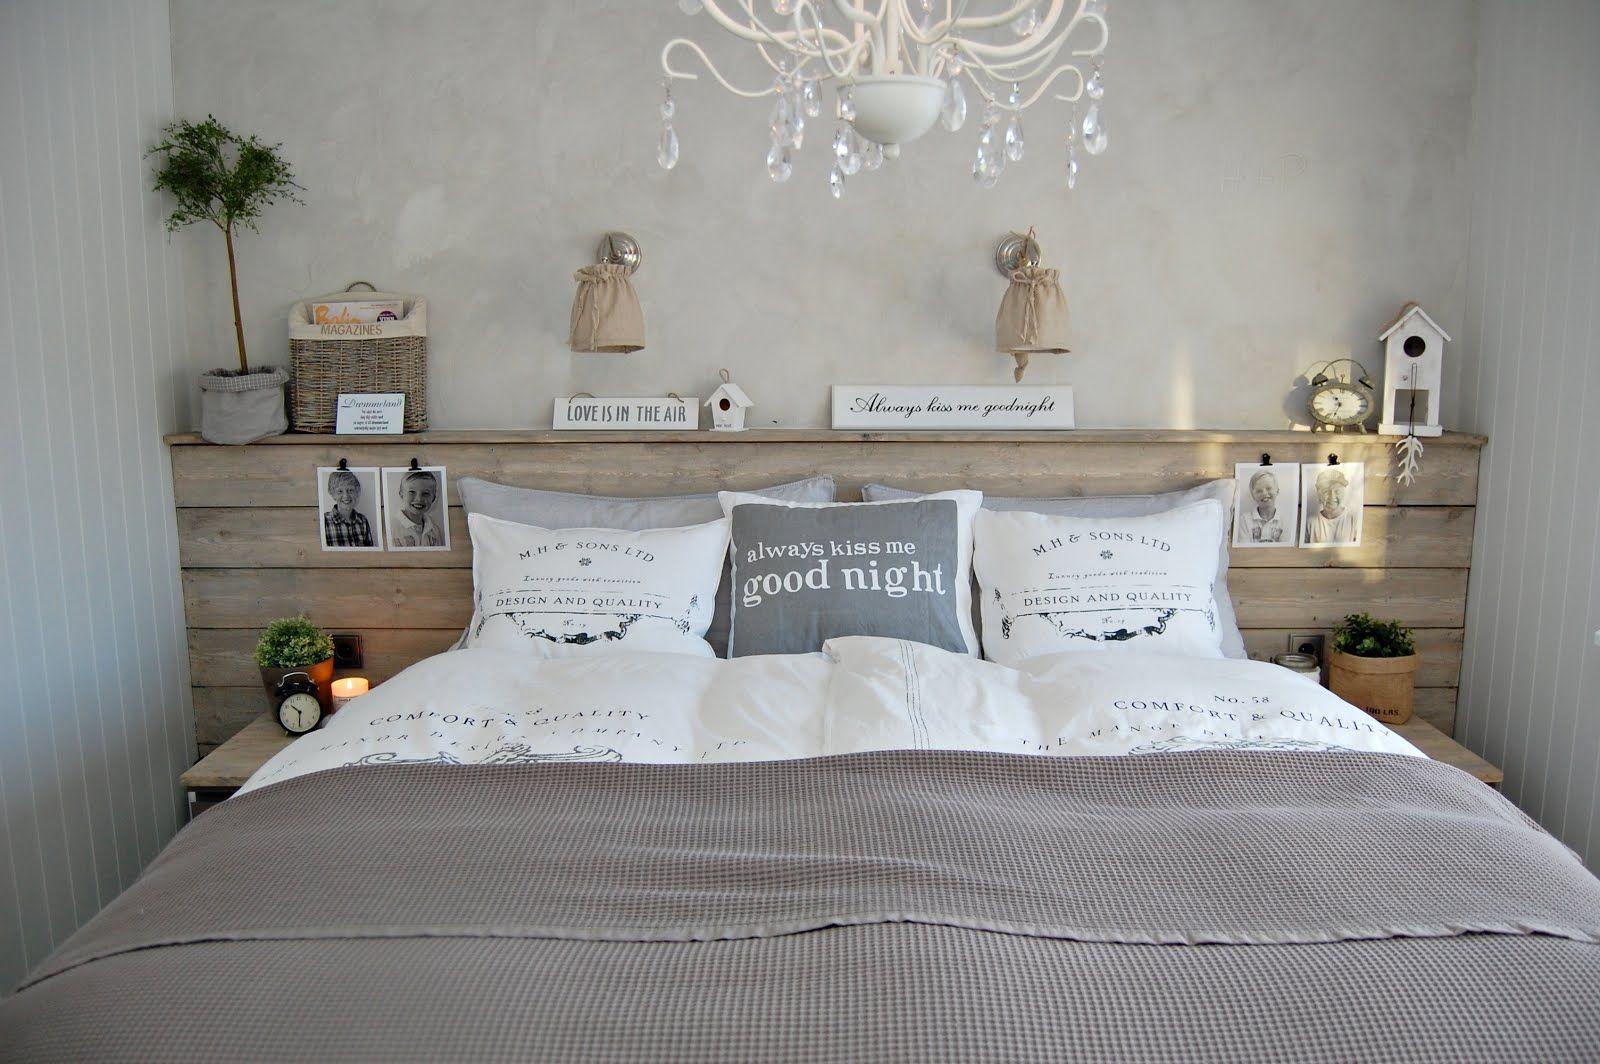 Tete De Lit En Planches Grisees Slaapkamerideeen Slaapkamer Steigerhout Interieur Slaapkamer